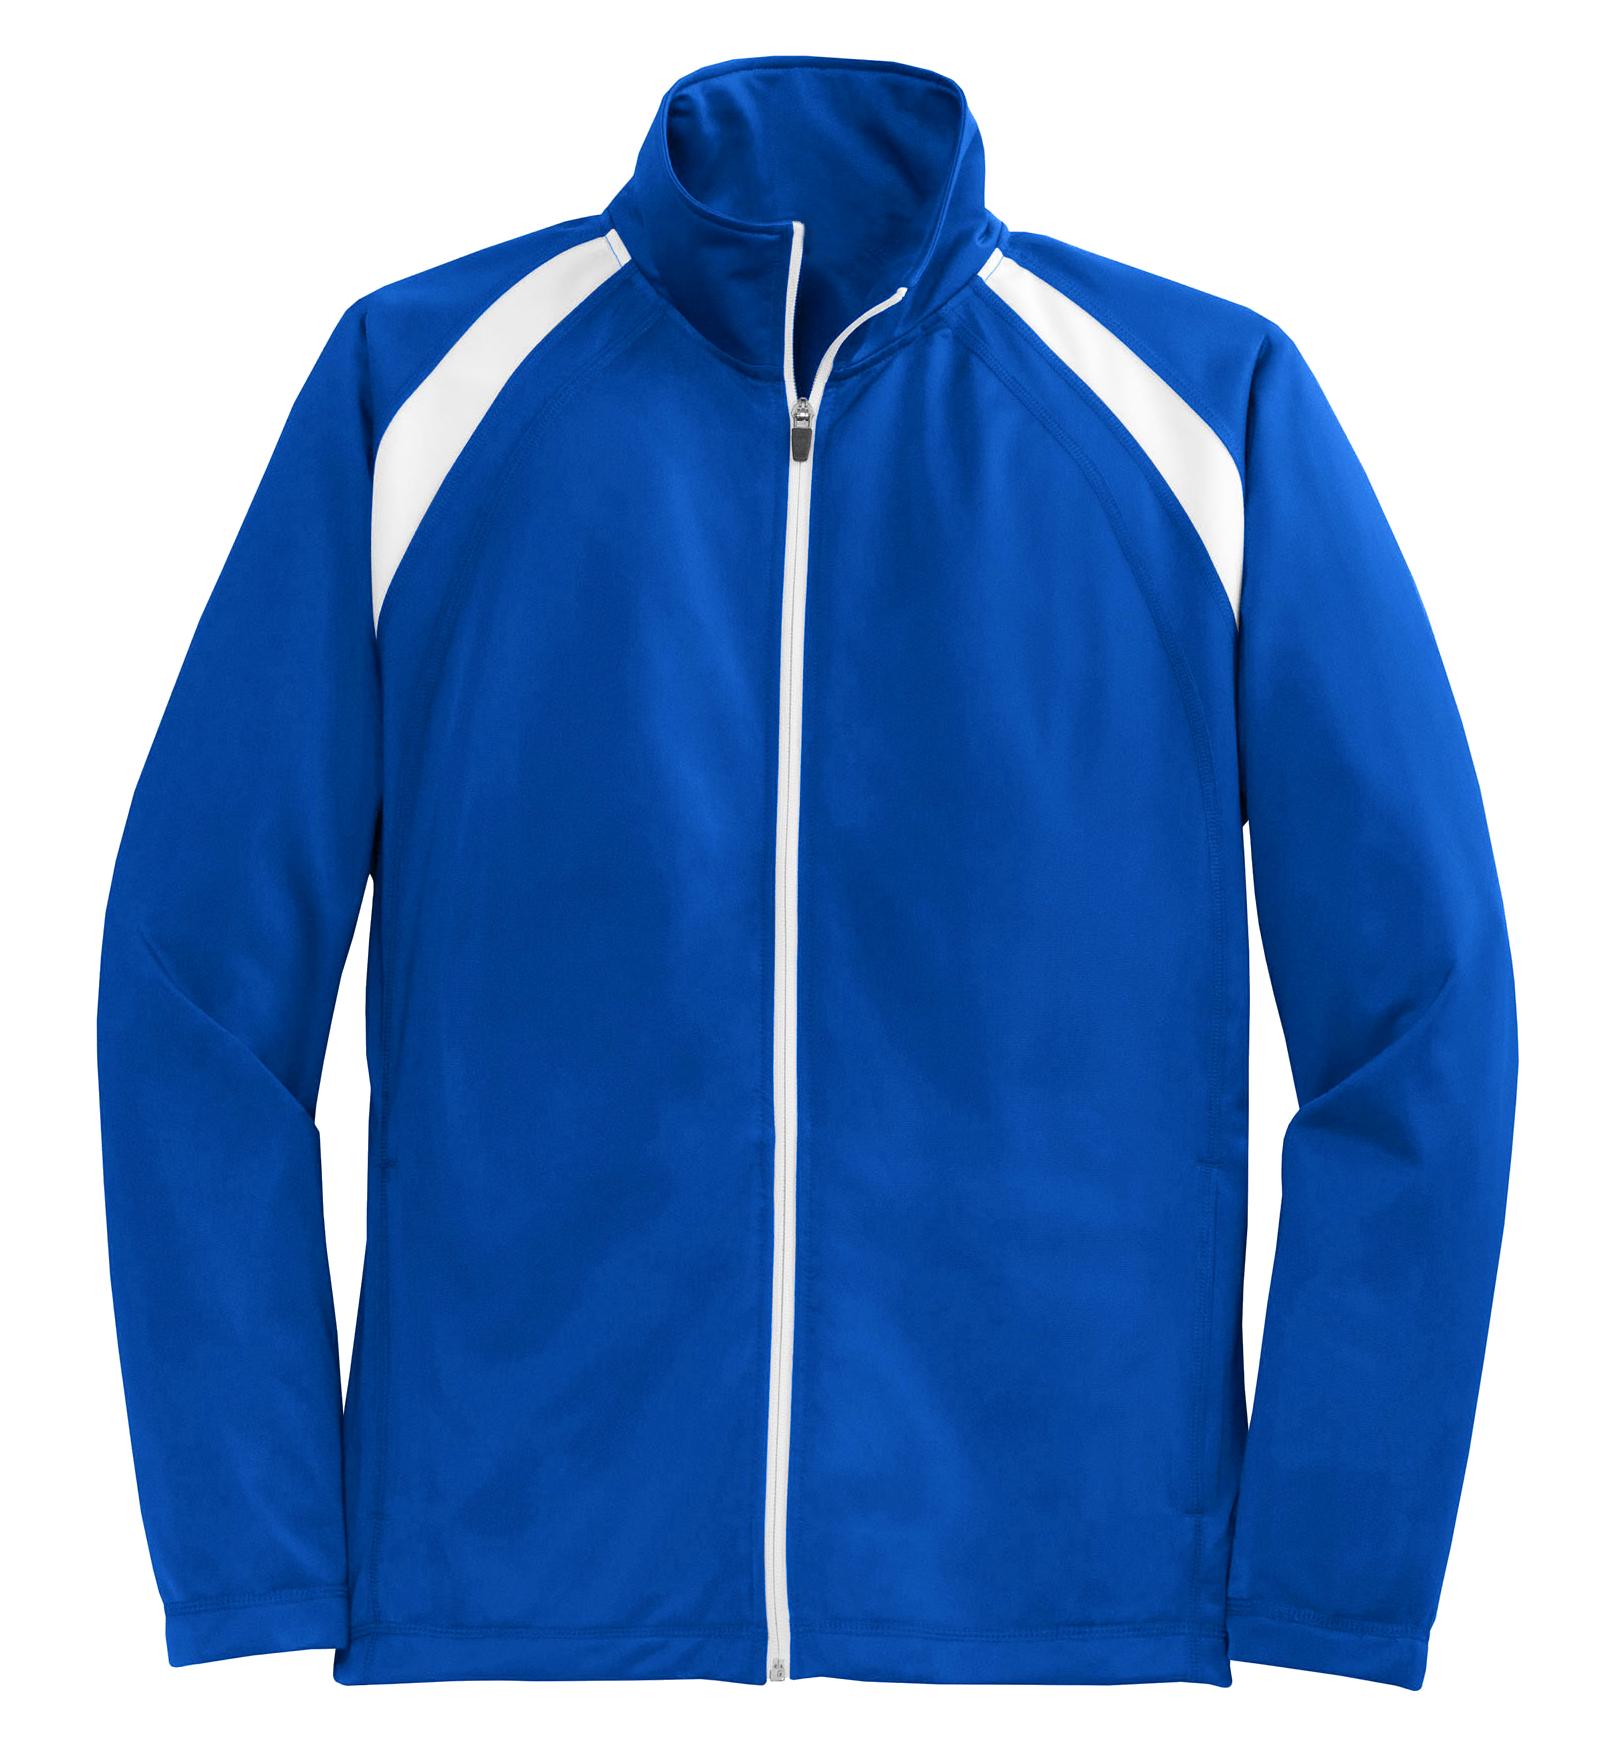 Jacket PNG Image.